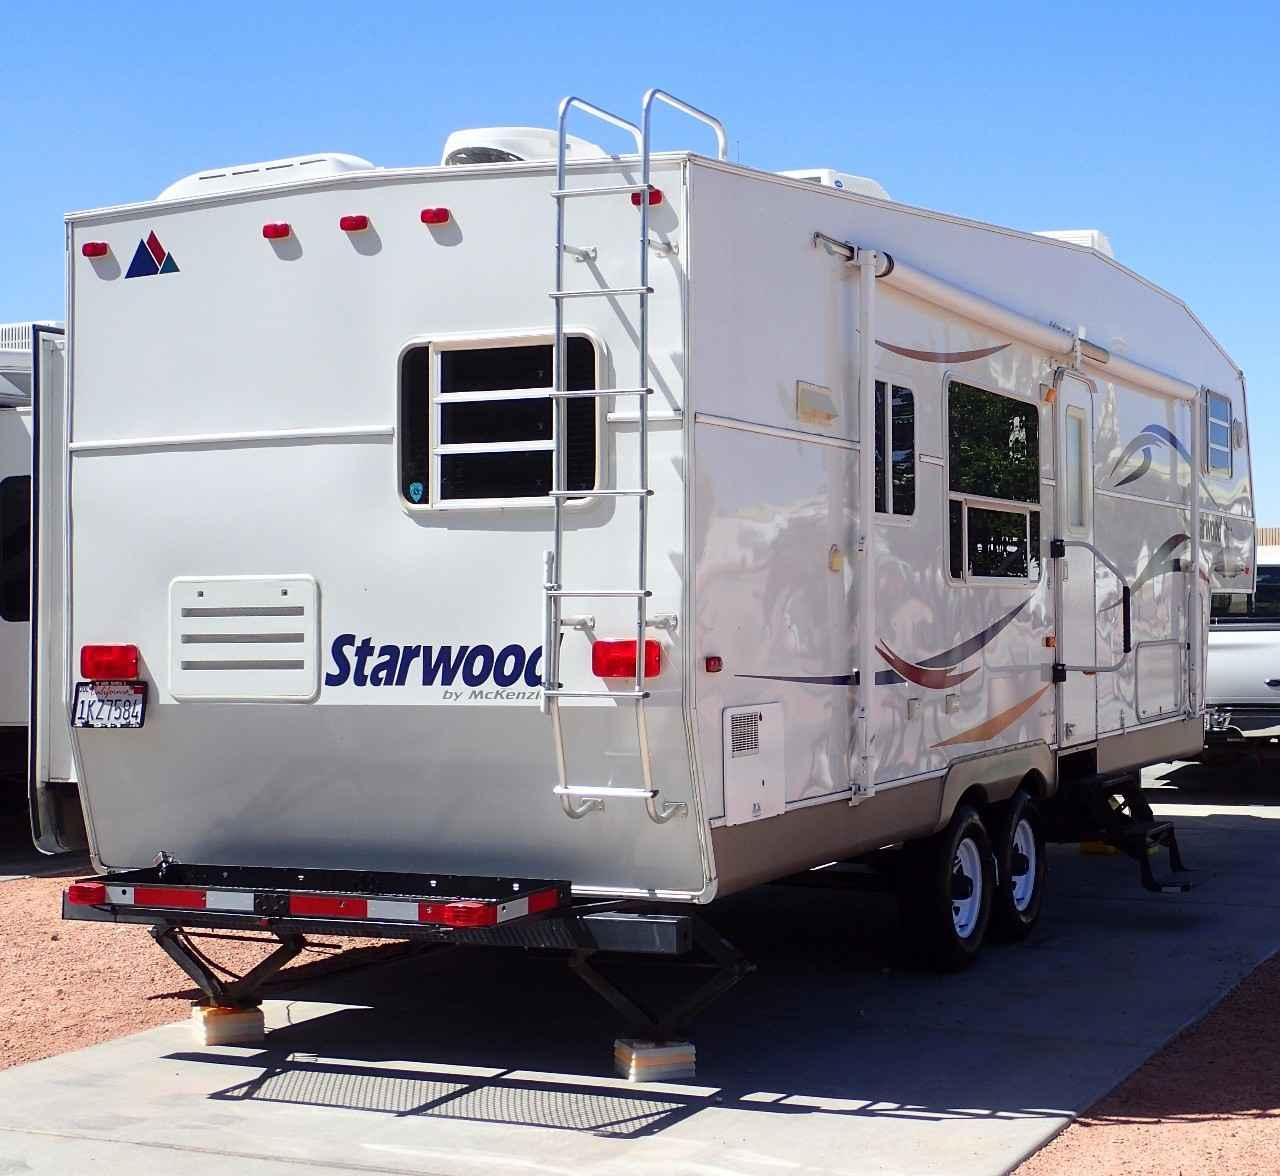 2005 Used Mckenzie STARWOOD 29RKS Fifth Wheel In California CA